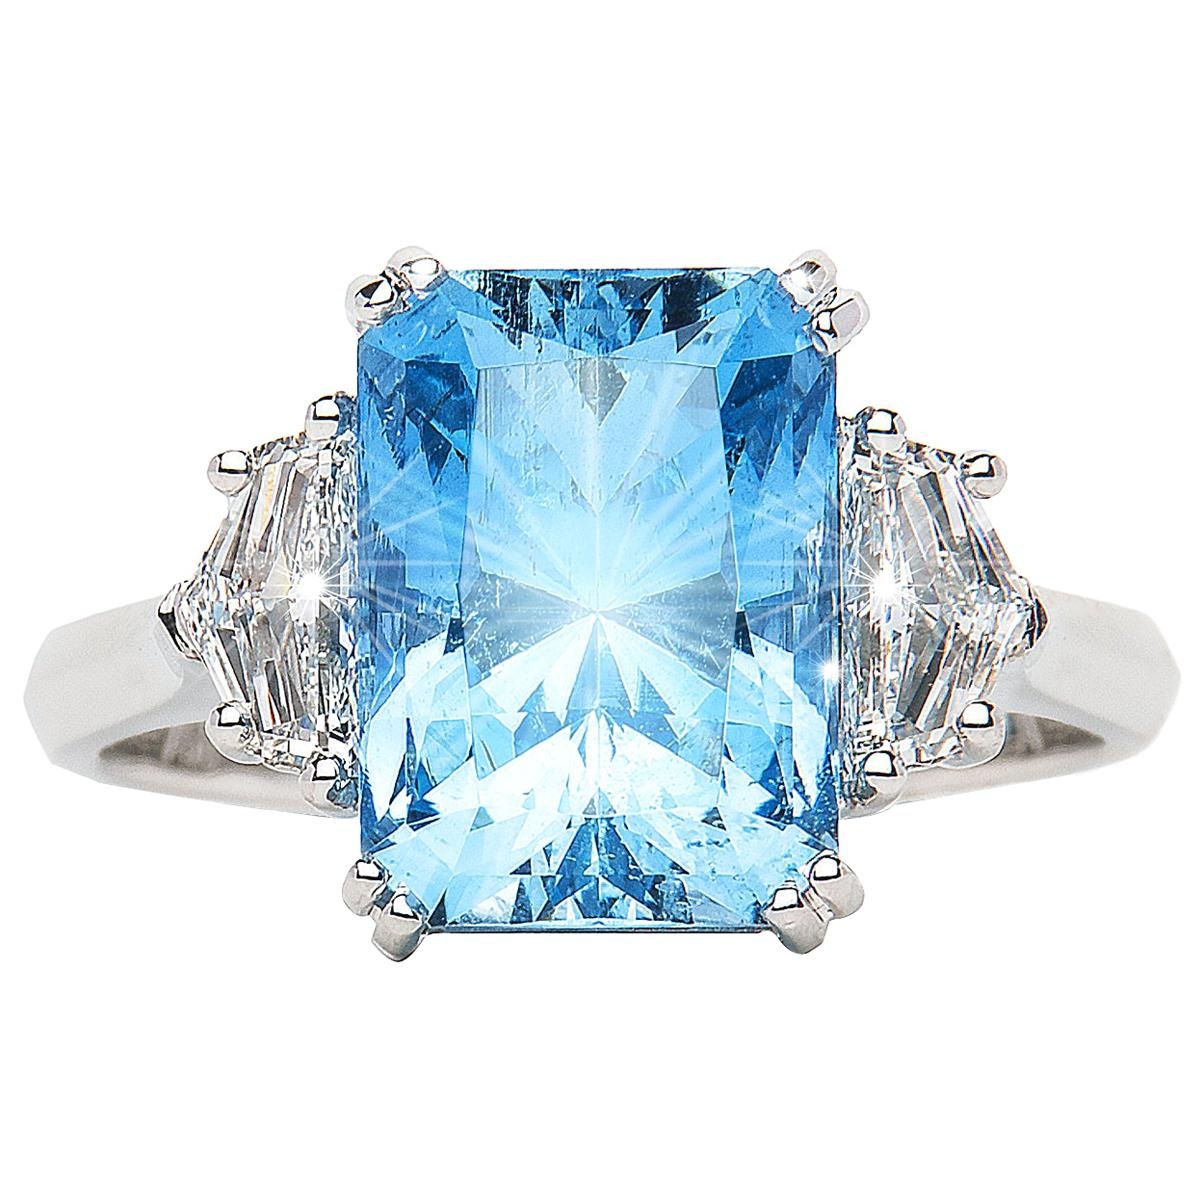 3.98 Carat Aquamarine Emerald Cut Diamond Three-Stone Ring Natalie Barney